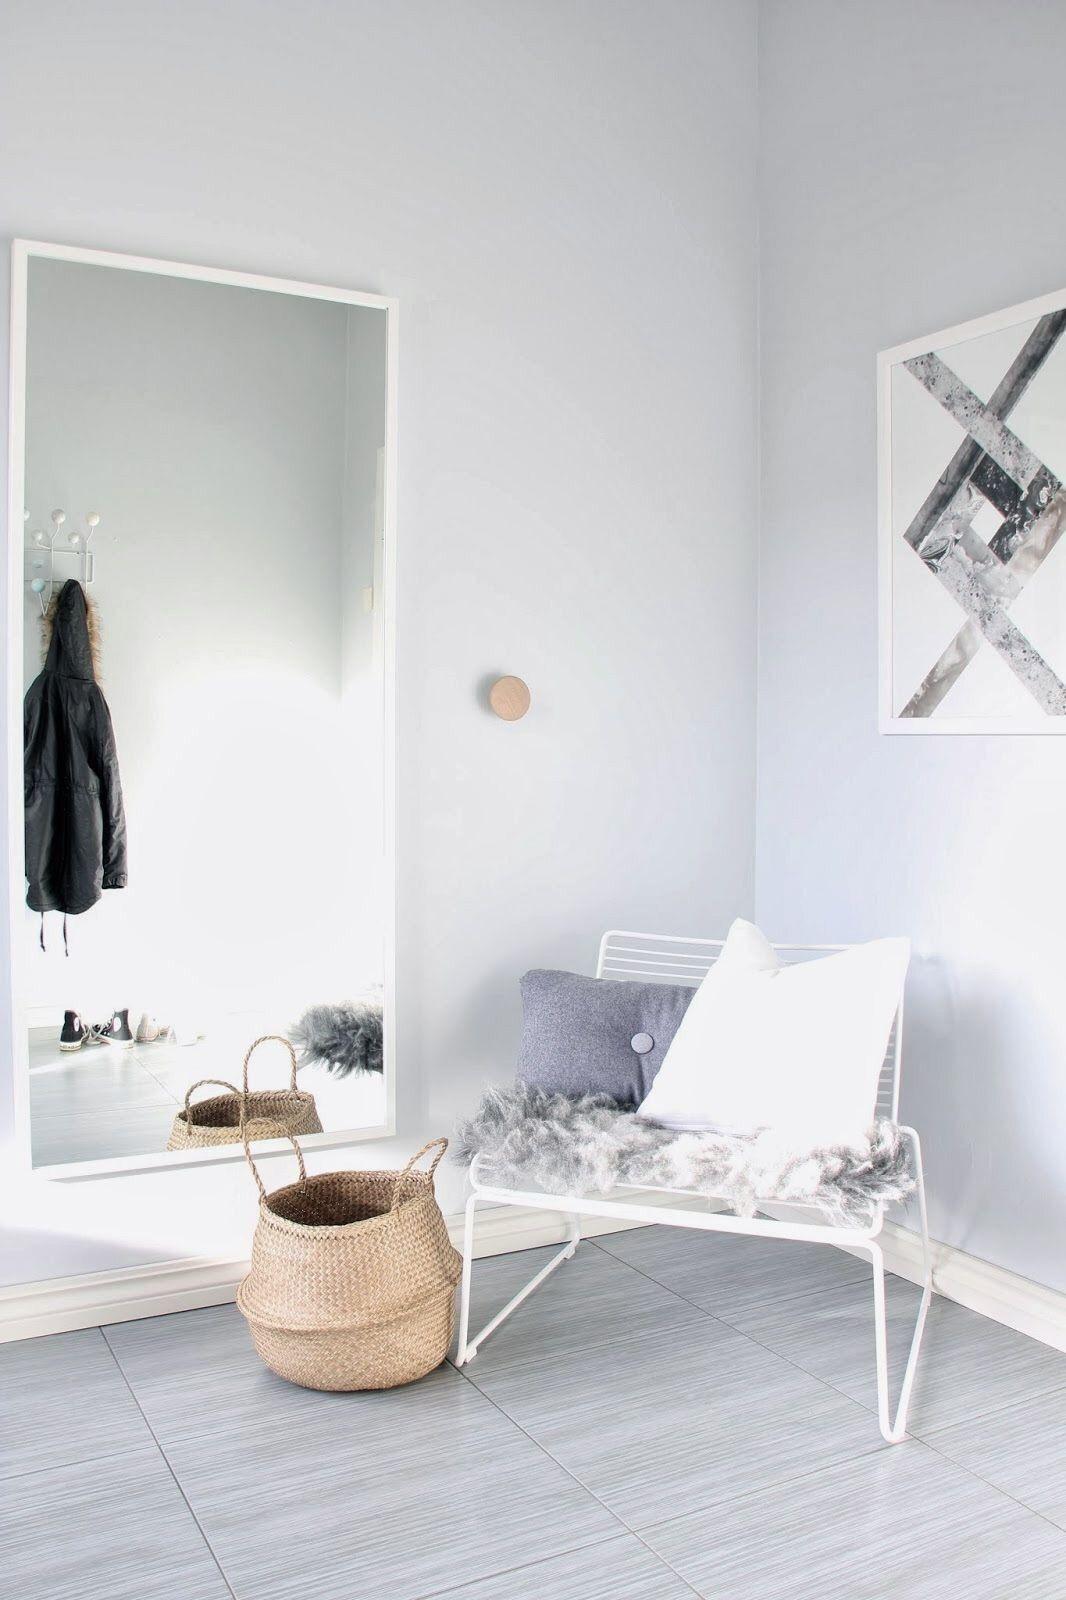 Hay Lounge Chair Hee | Scandinavian Mood | Pinterest | Flur ideen ...